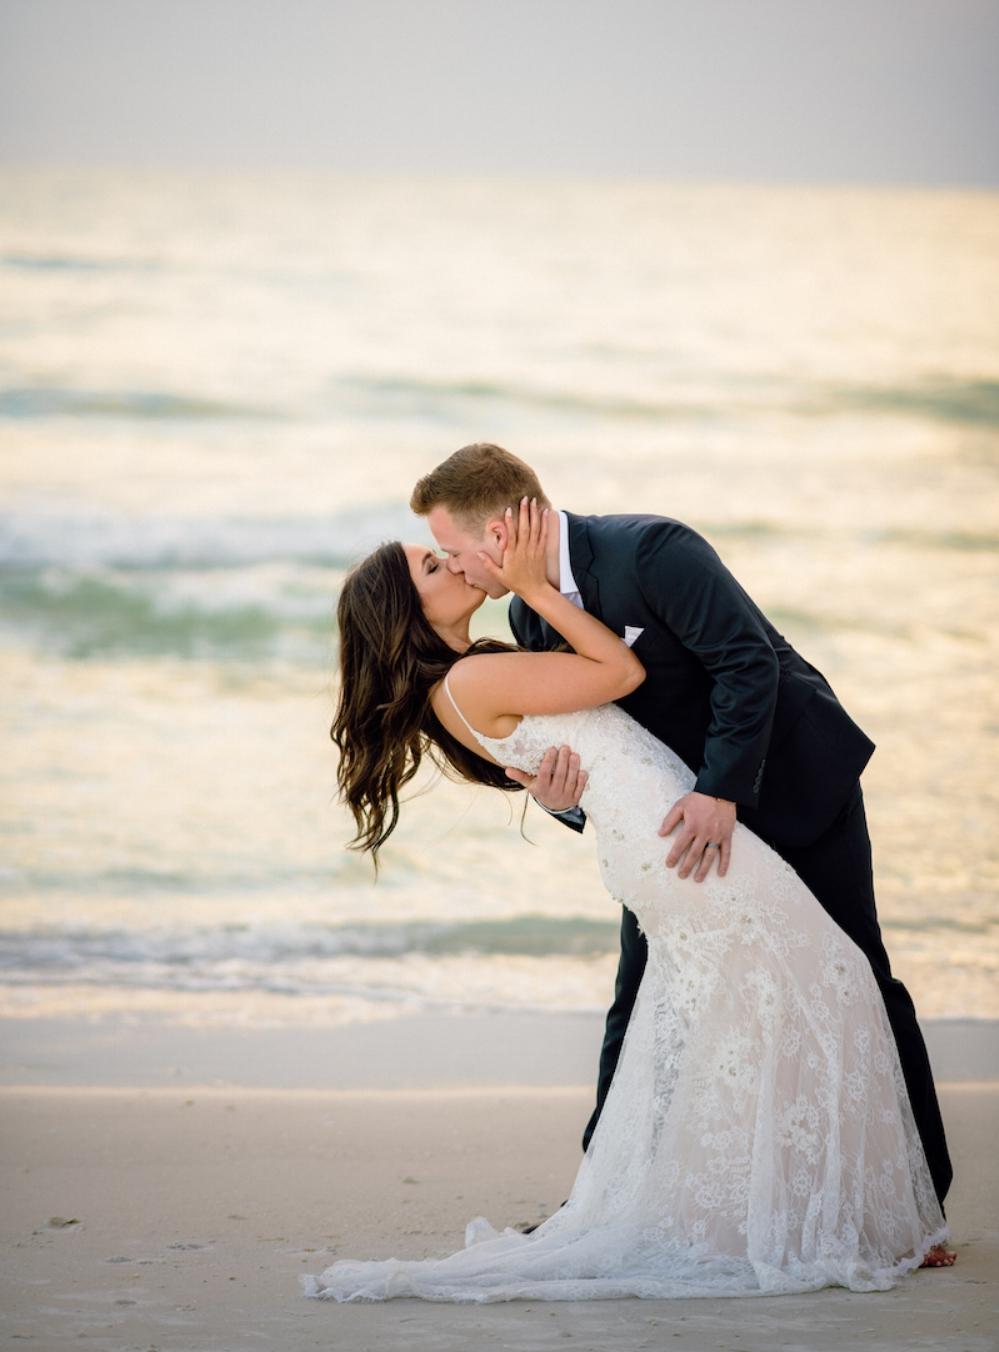 JW Marriott Marco Island Beach Weddings Matt Steeves Photography 5.jpg